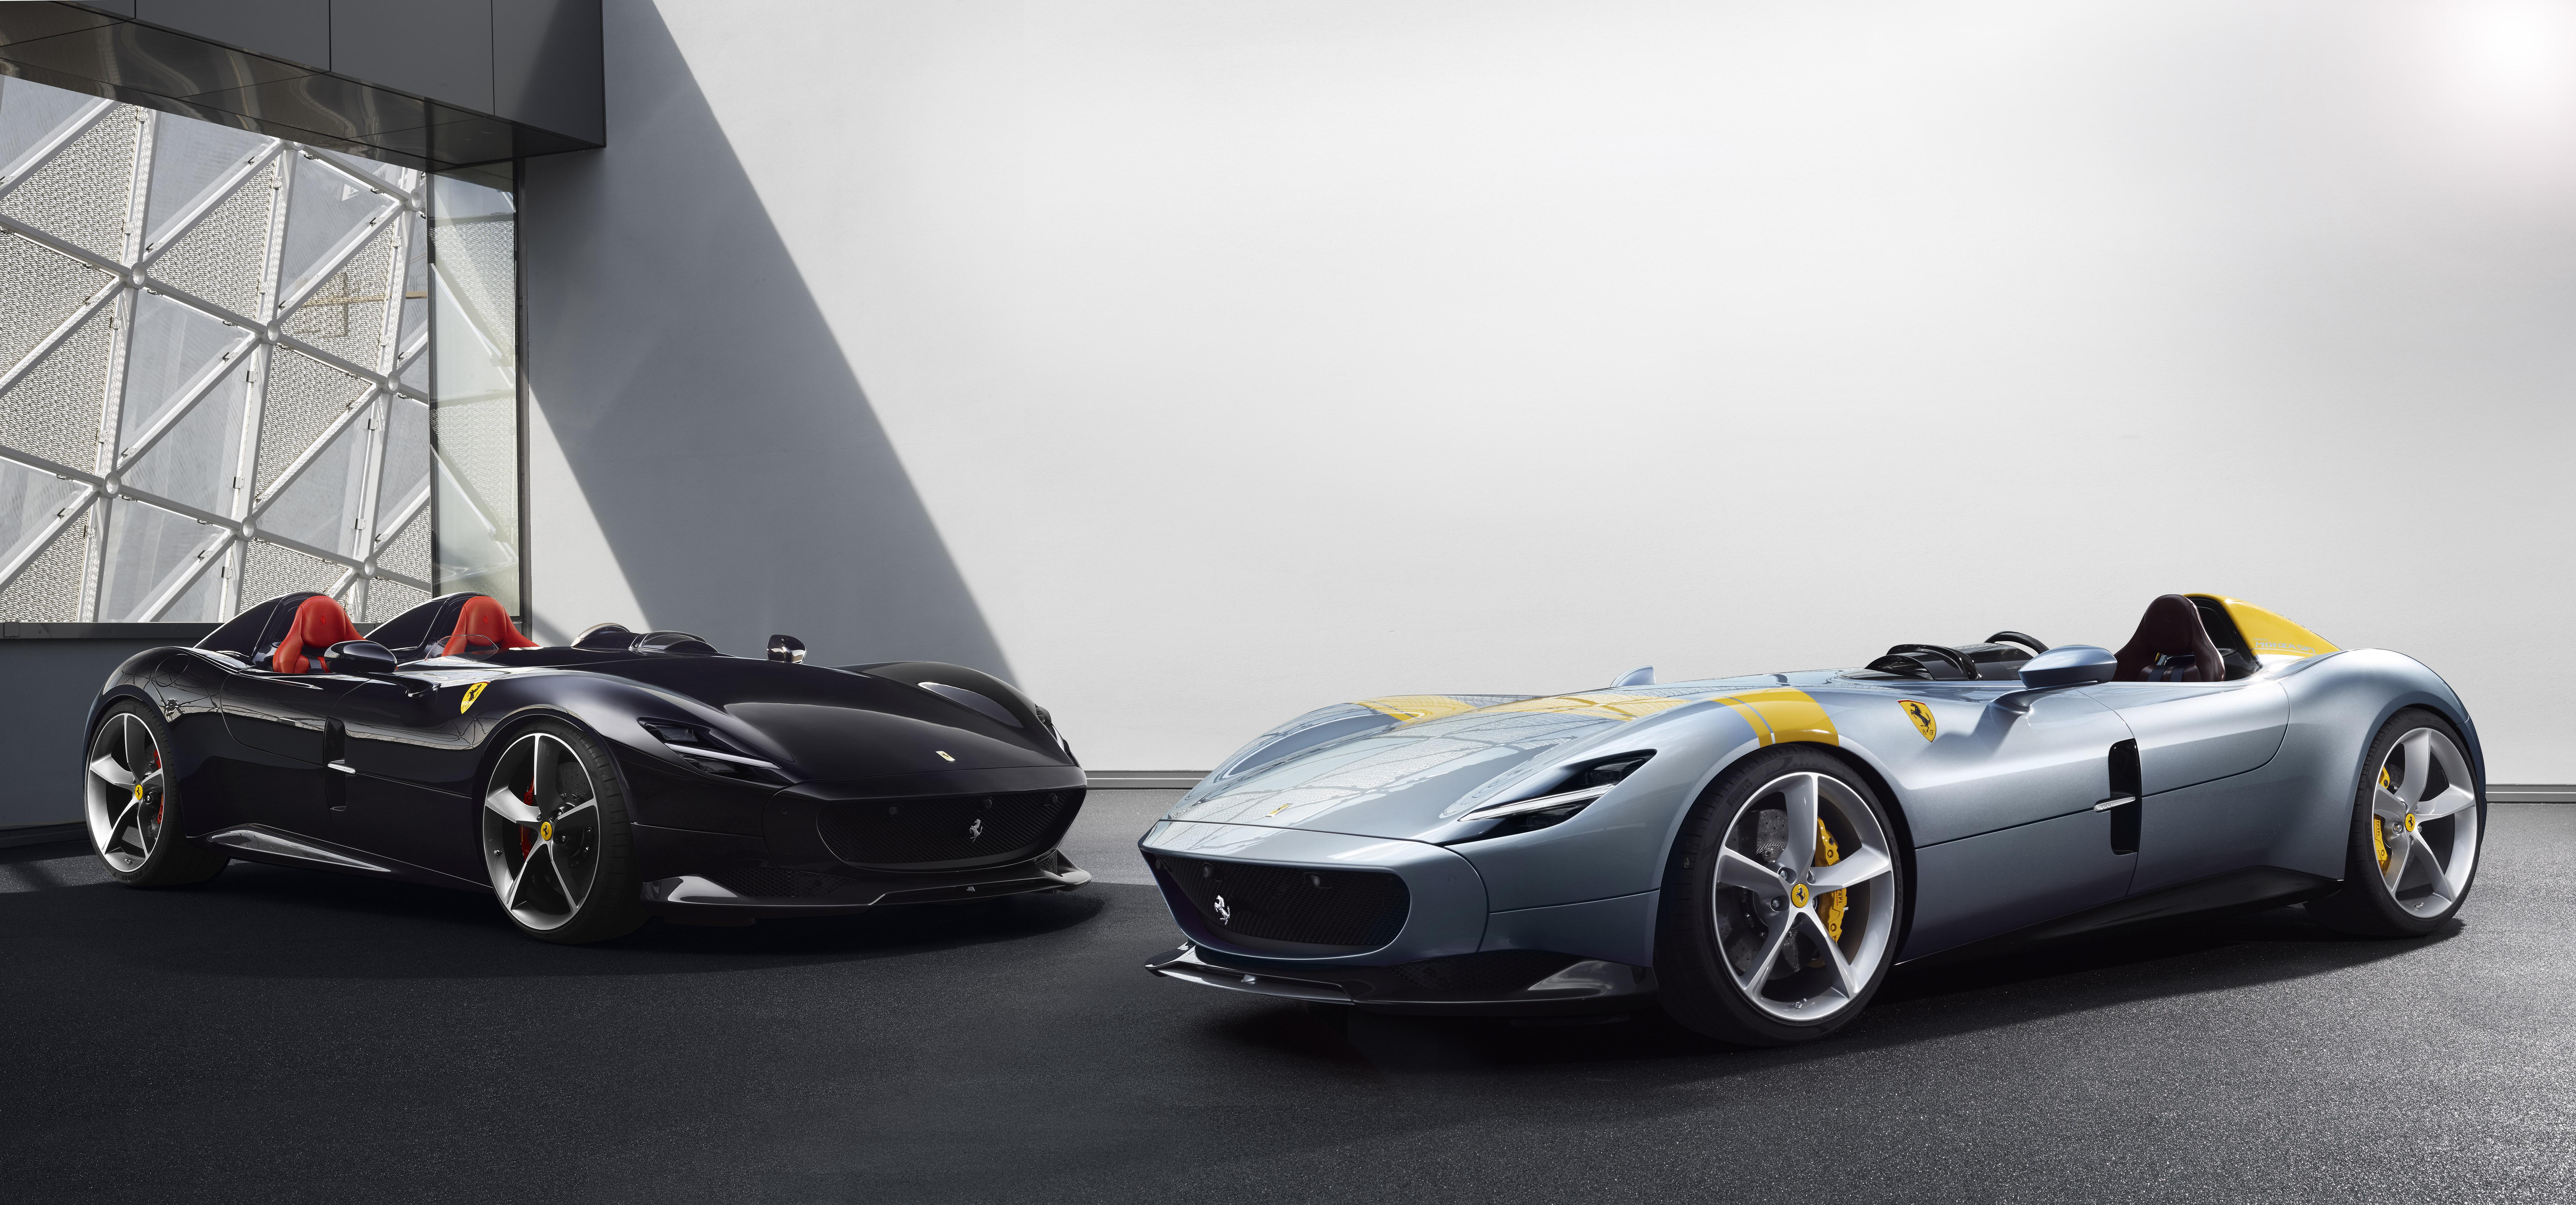 Ferrari Monza SP1 and SP2 Revealed